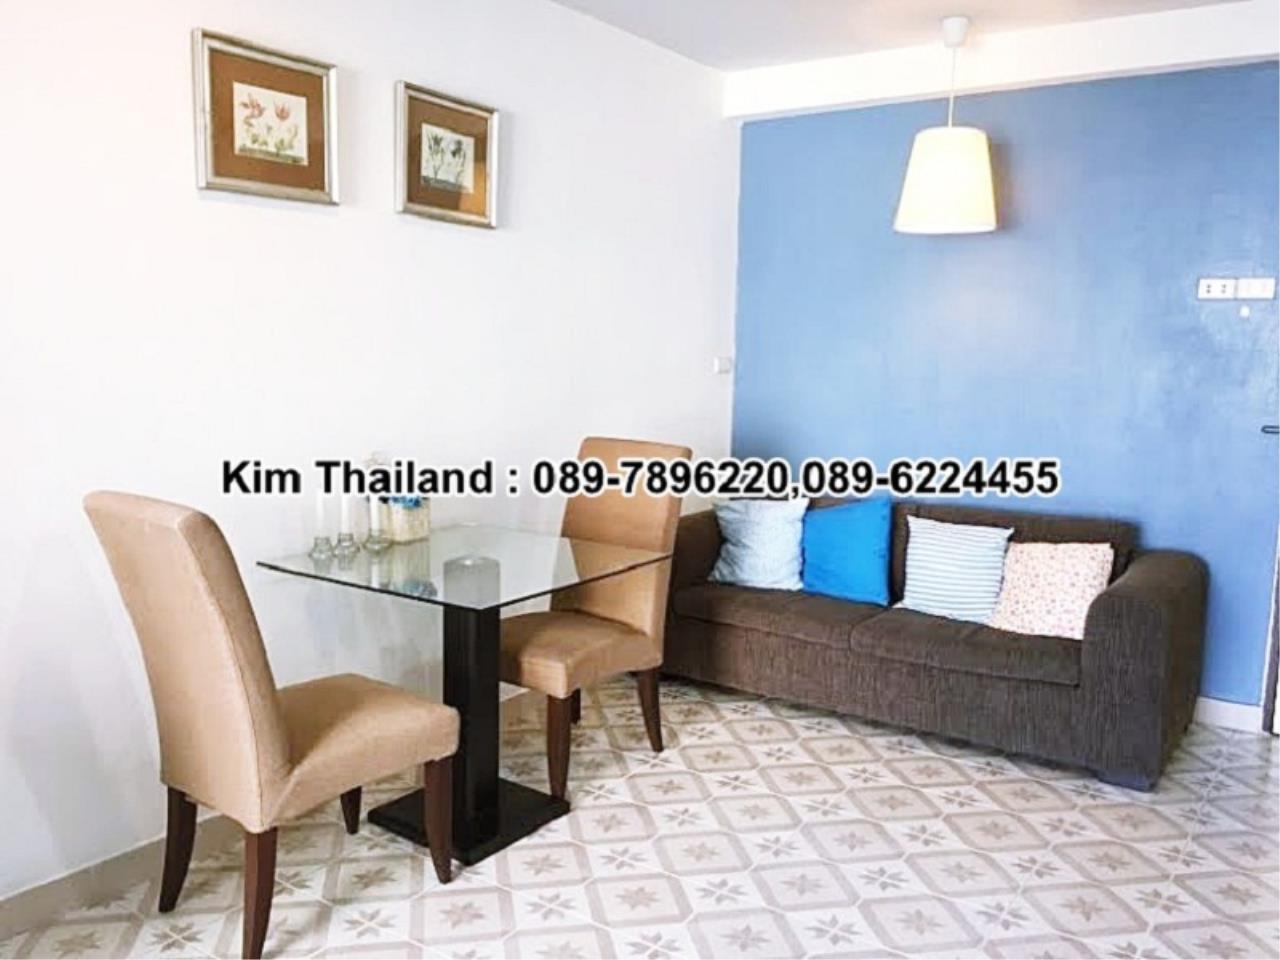 BKKcondorental Agency's For rent, Condo Saranjai Mansion. Area 35 sq.m. Studio. Rent 16,000baht/month 1